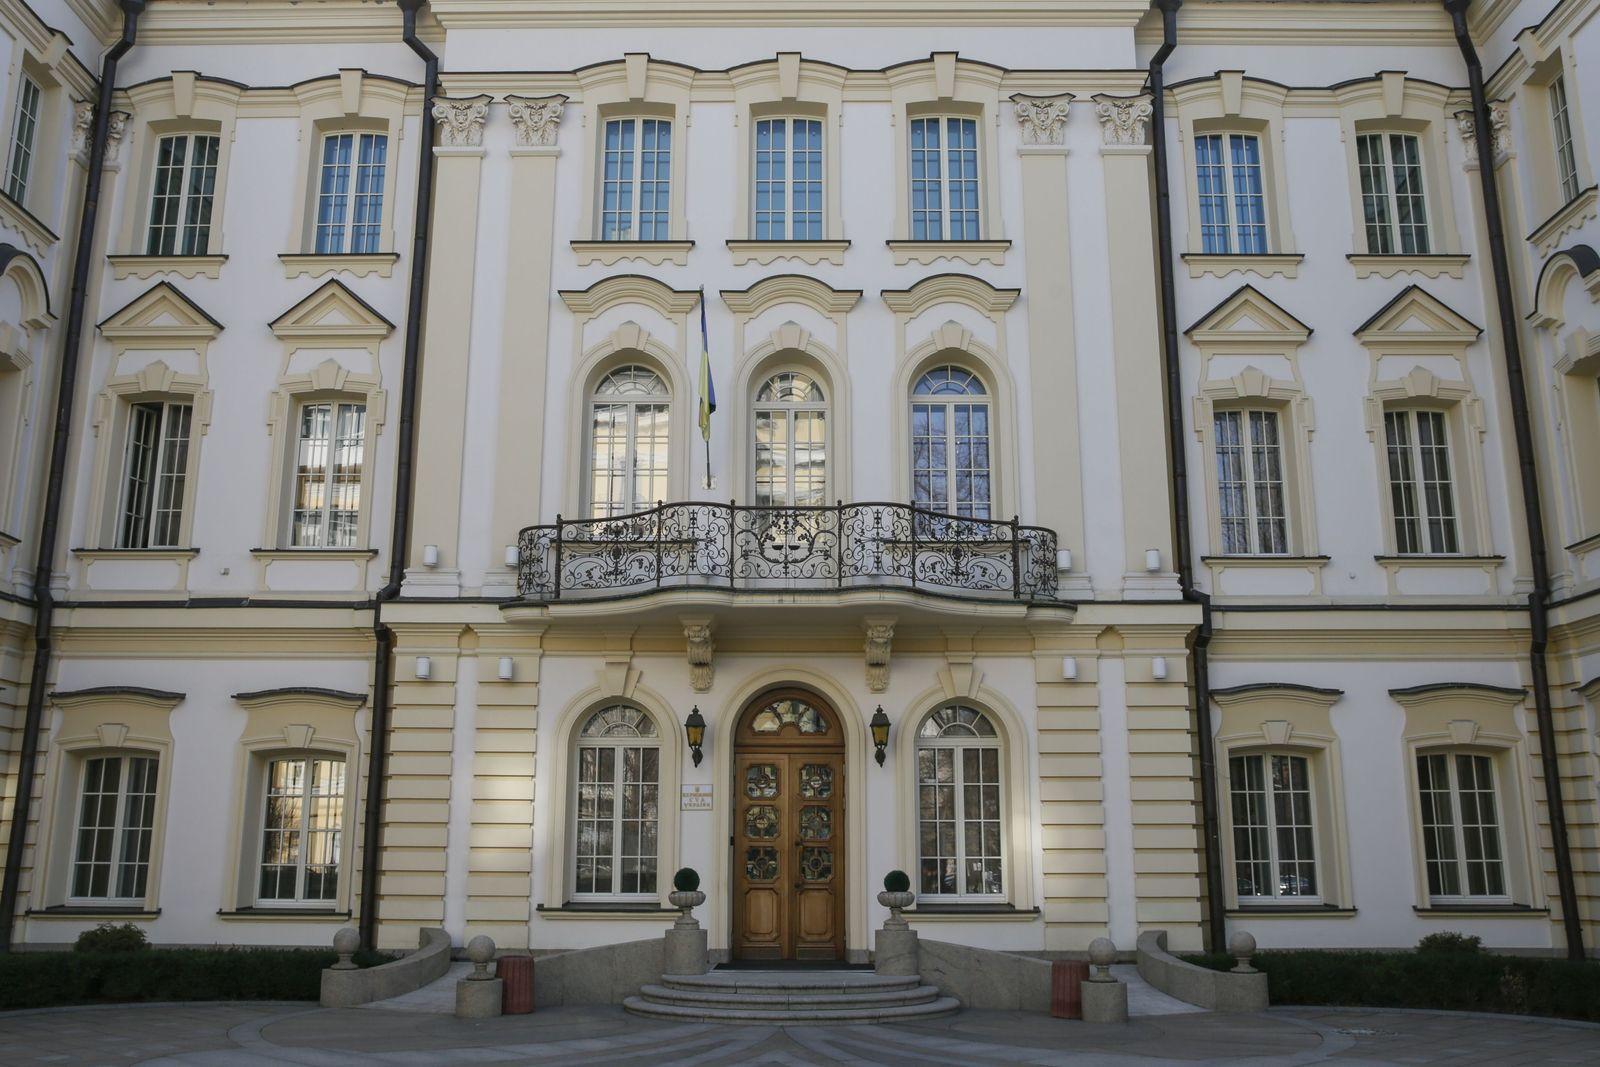 Ukrainian Supreme Court building is seen in central Kiev